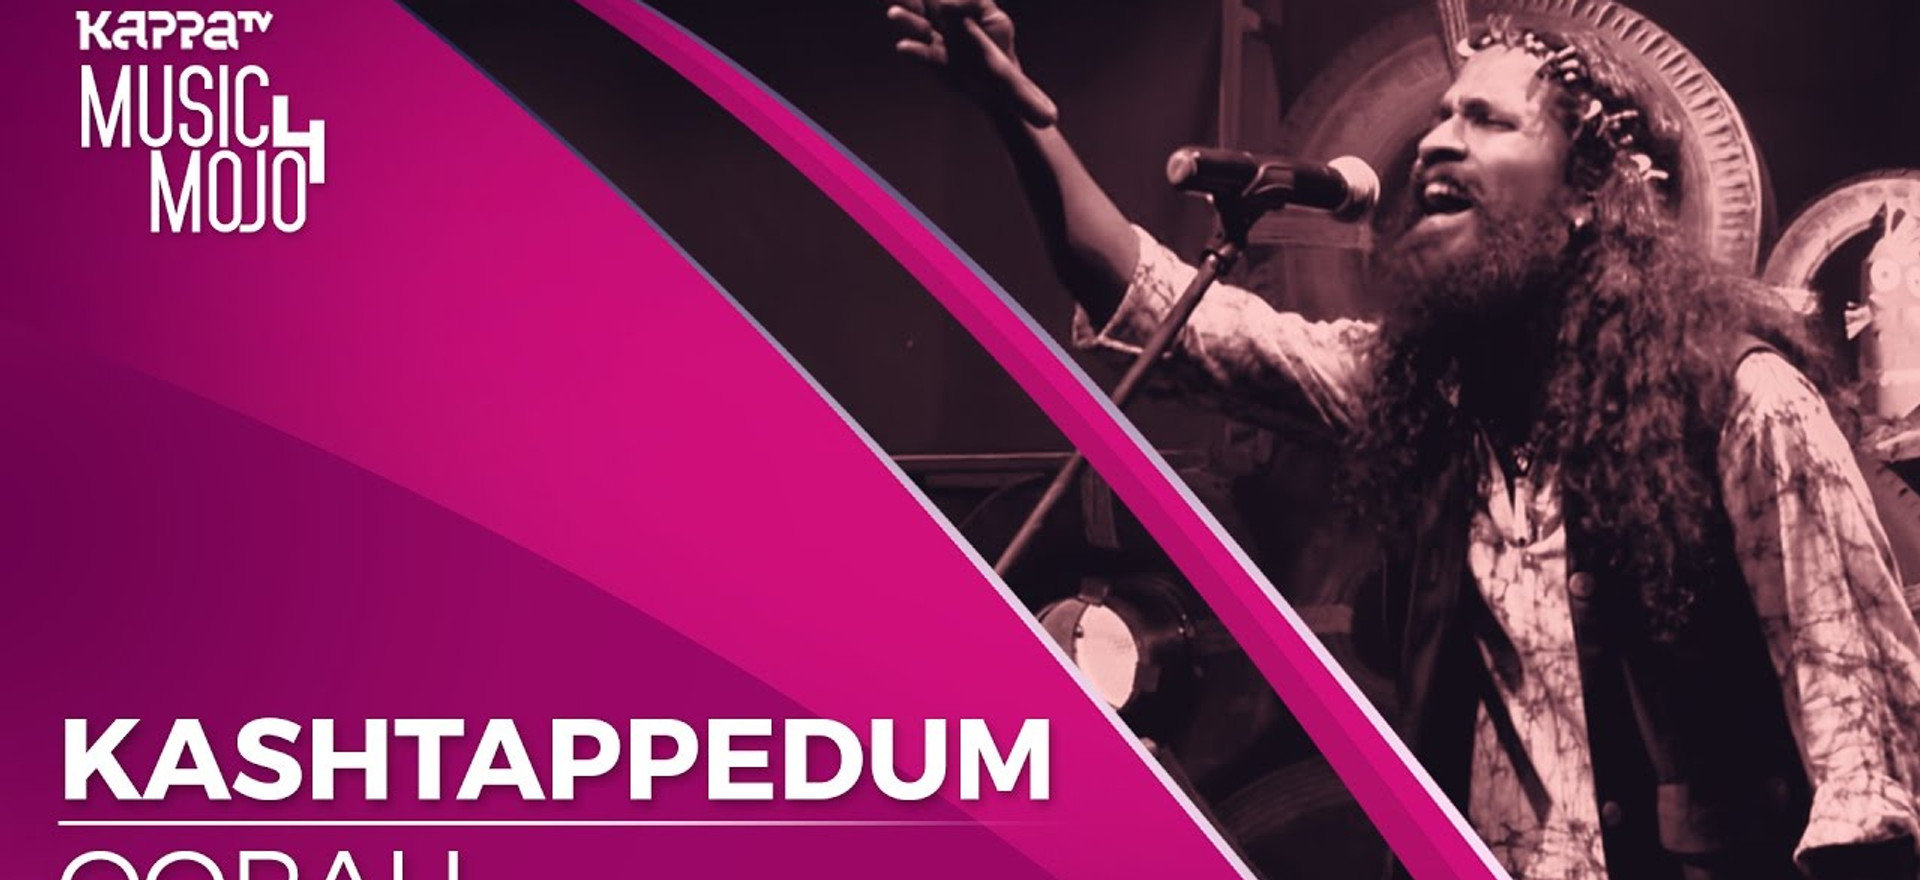 Kashtappedum - Oorali - Music Mojo season 4 - KappaTV